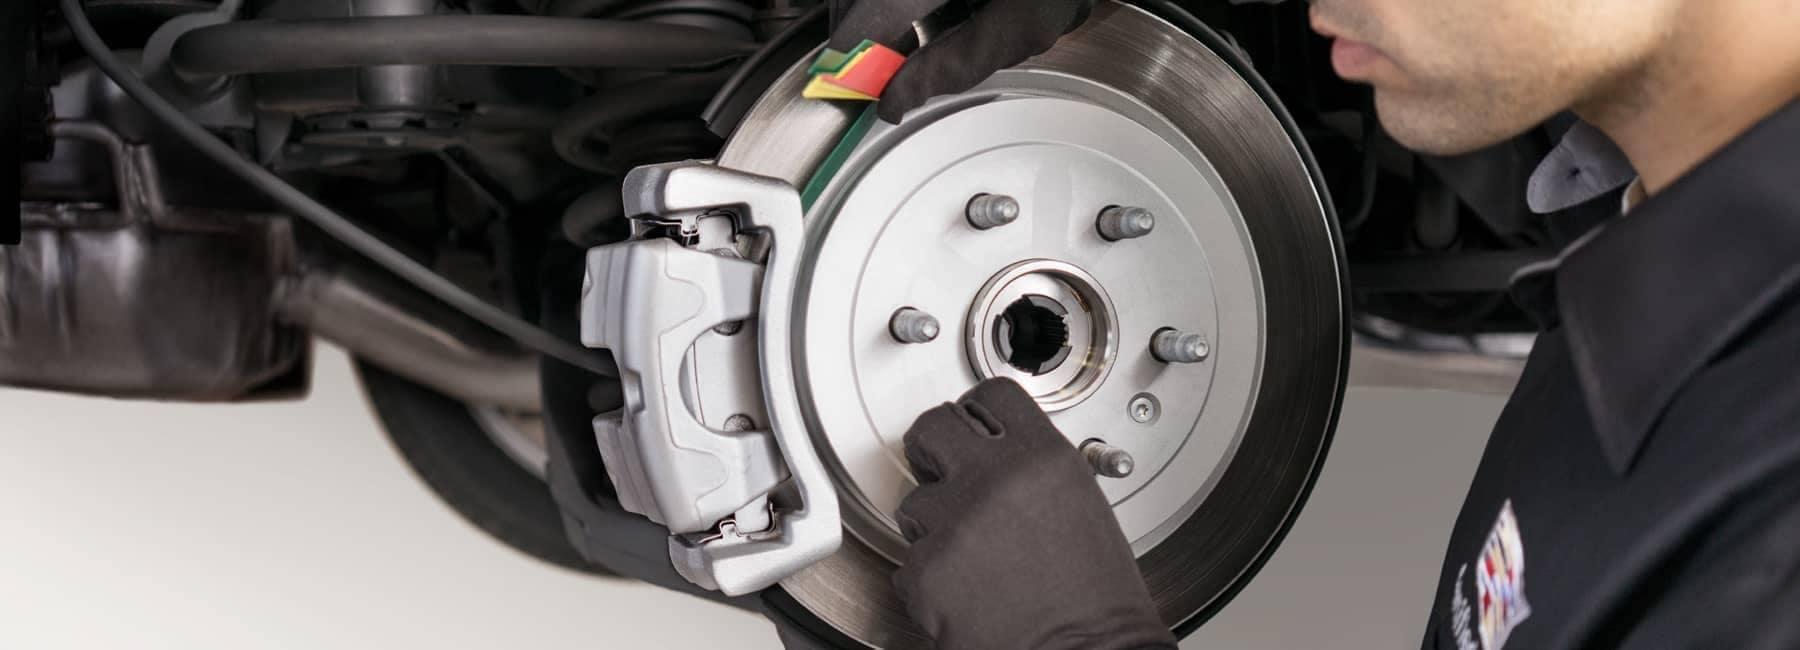 GM-Cadillac-Service-Technician-Rotors-and-Brakes